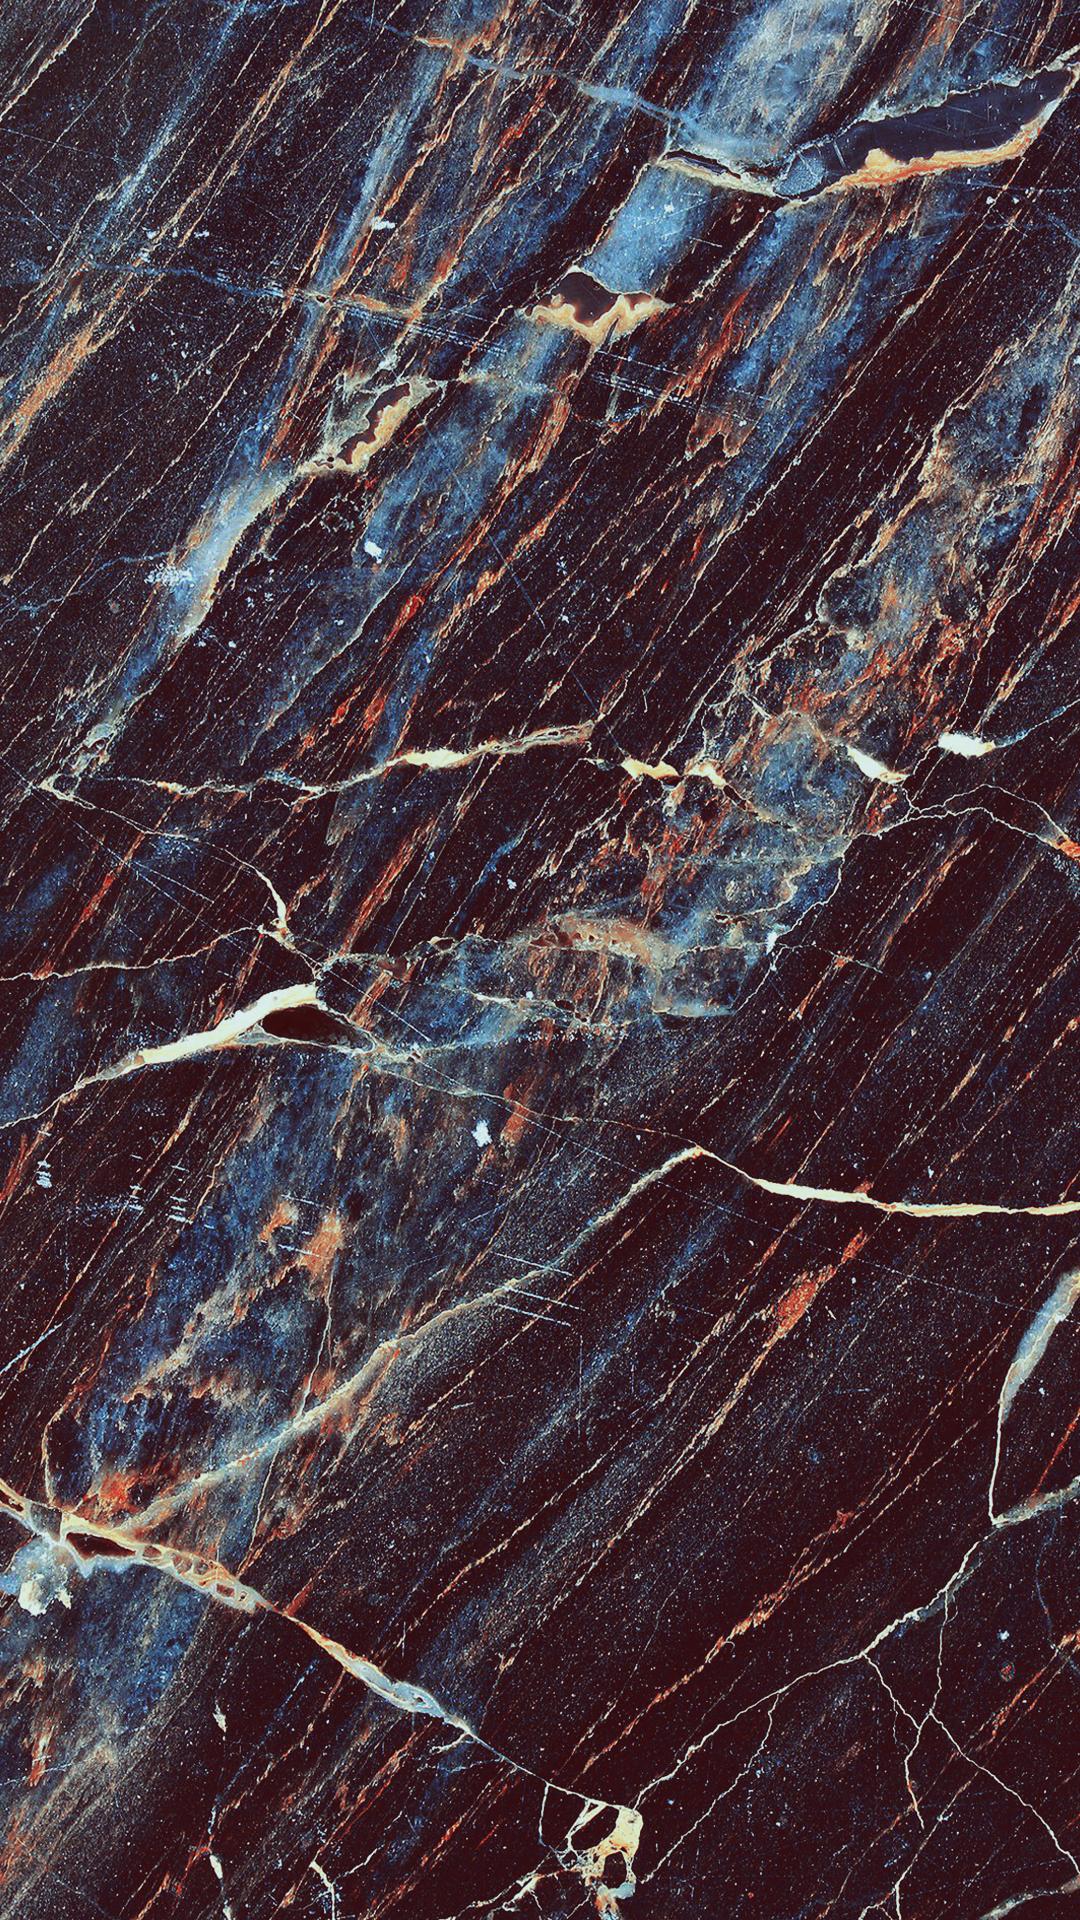 My Lockscreens - Marble #marbletexture